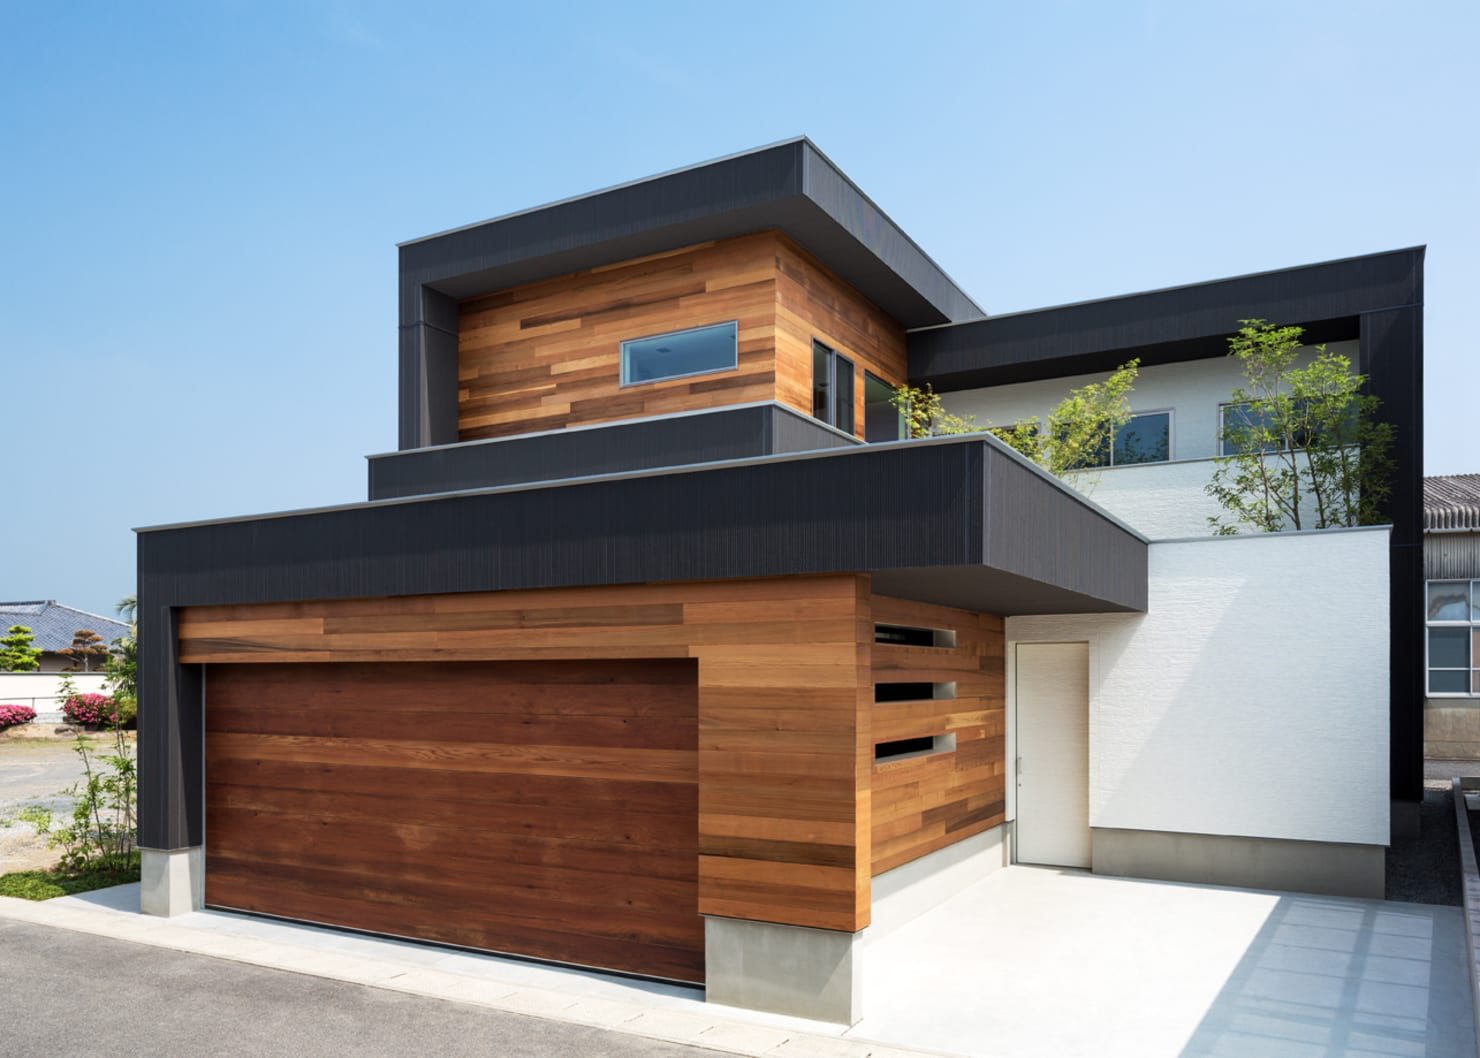 10 amazing colours for your home's façade